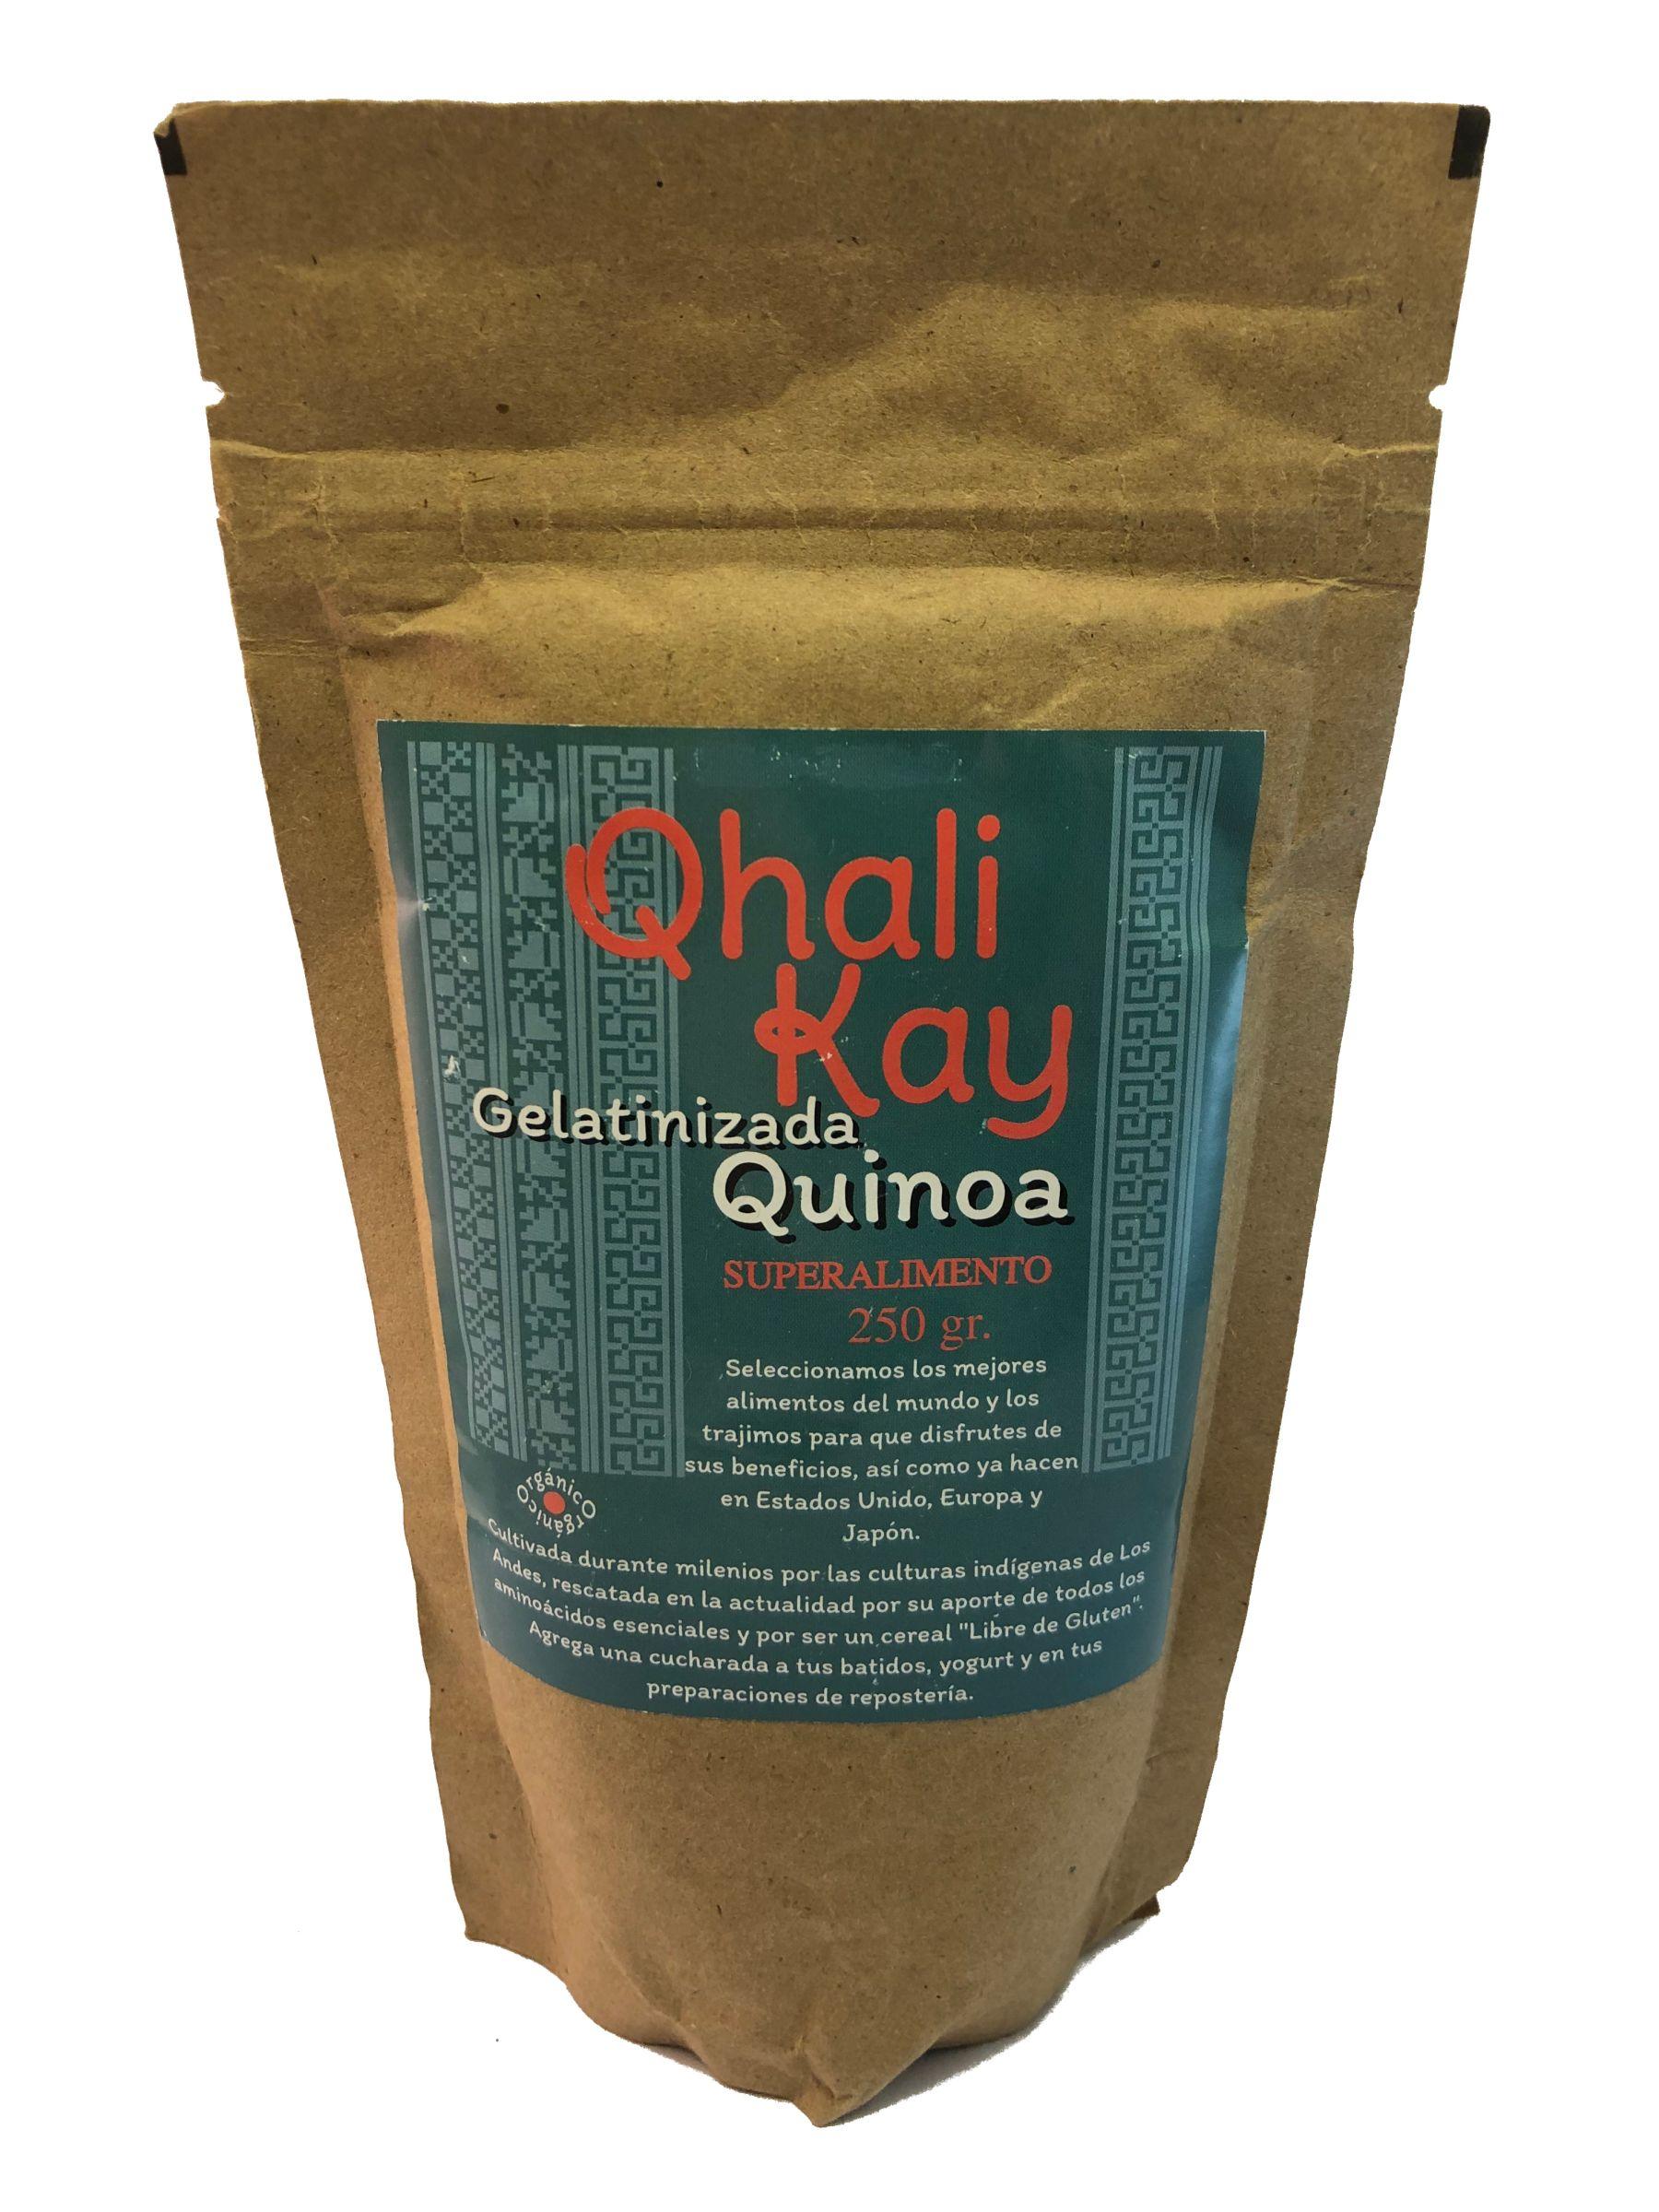 Quinoa gelatinizada 250 grs